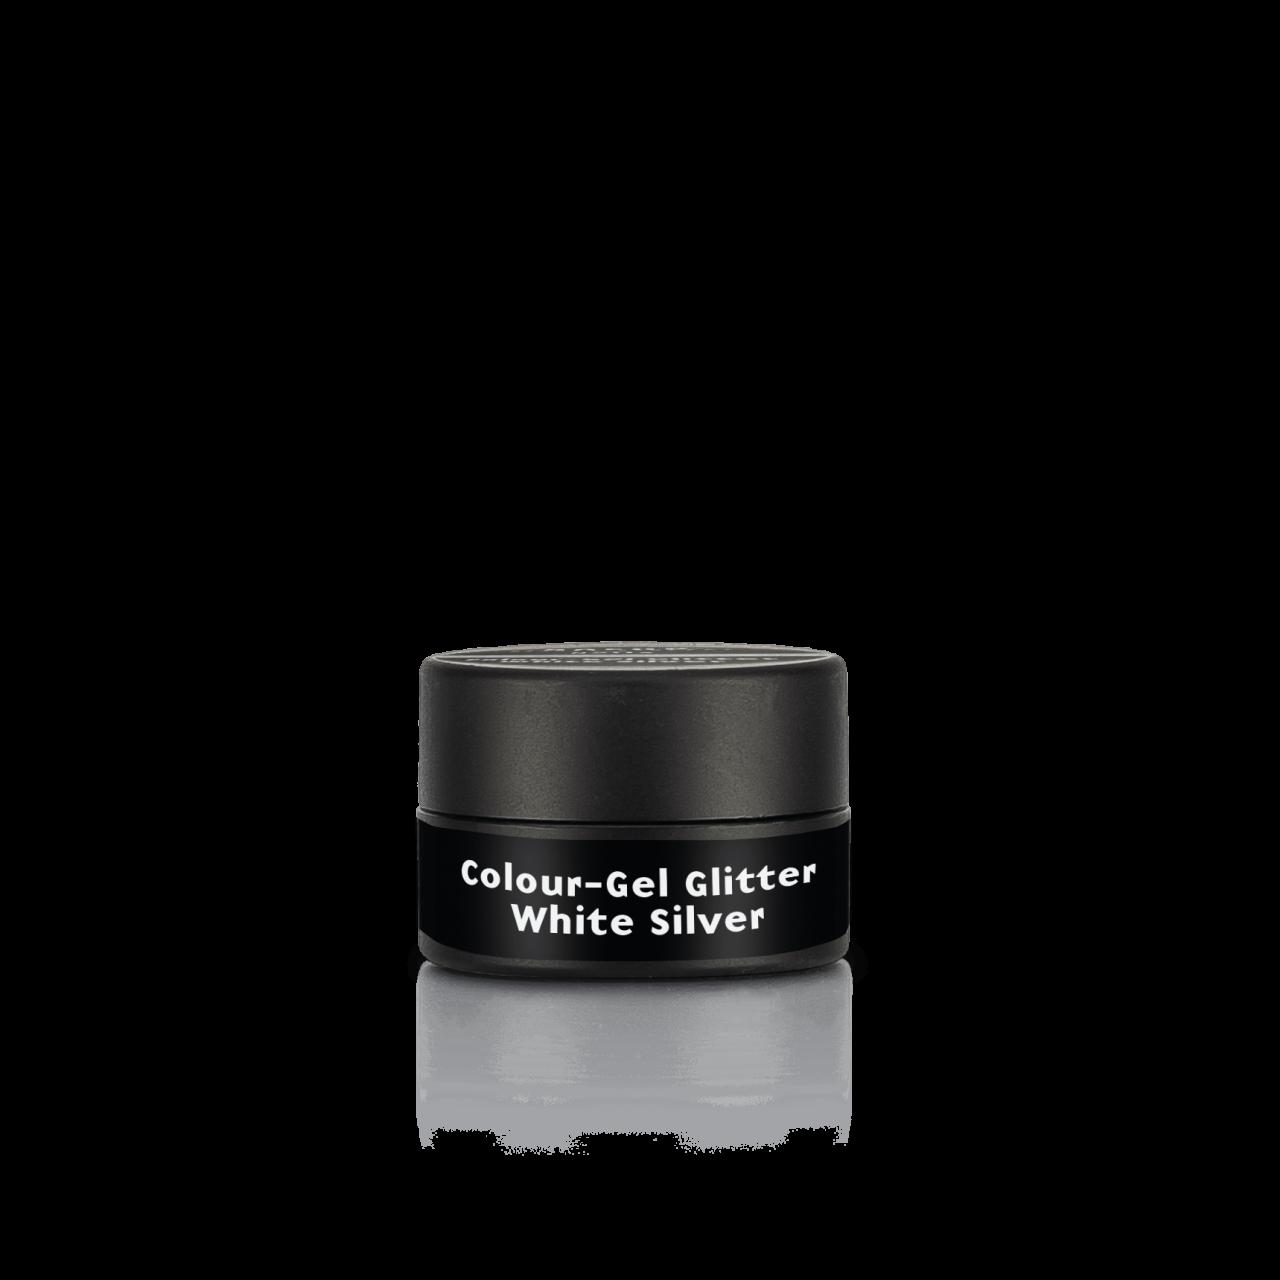 Colour-Gel Glitter White Silver 5 ml